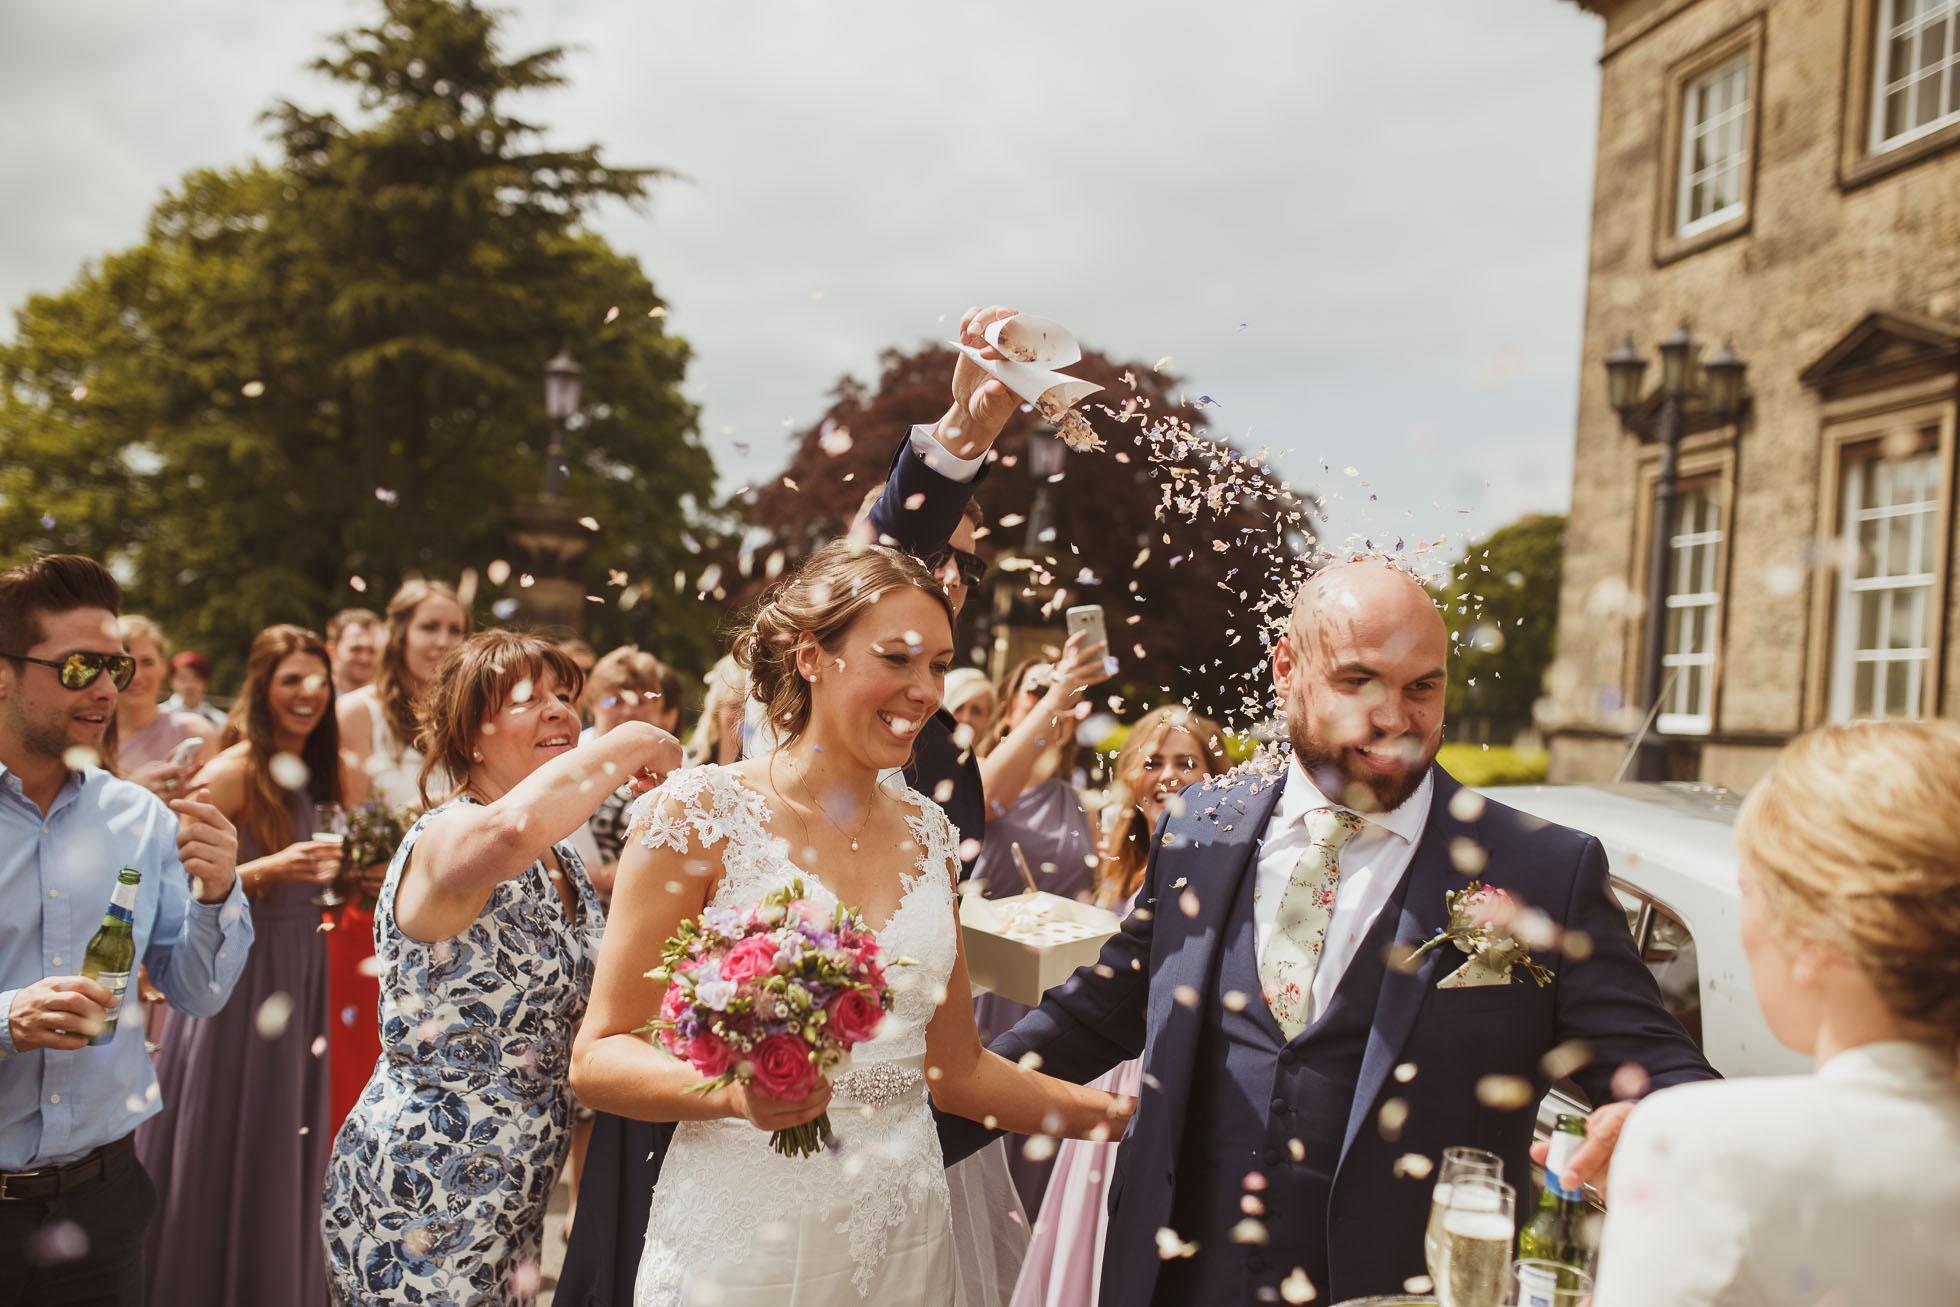 denton-hall-wedding-photographer-41.jpg